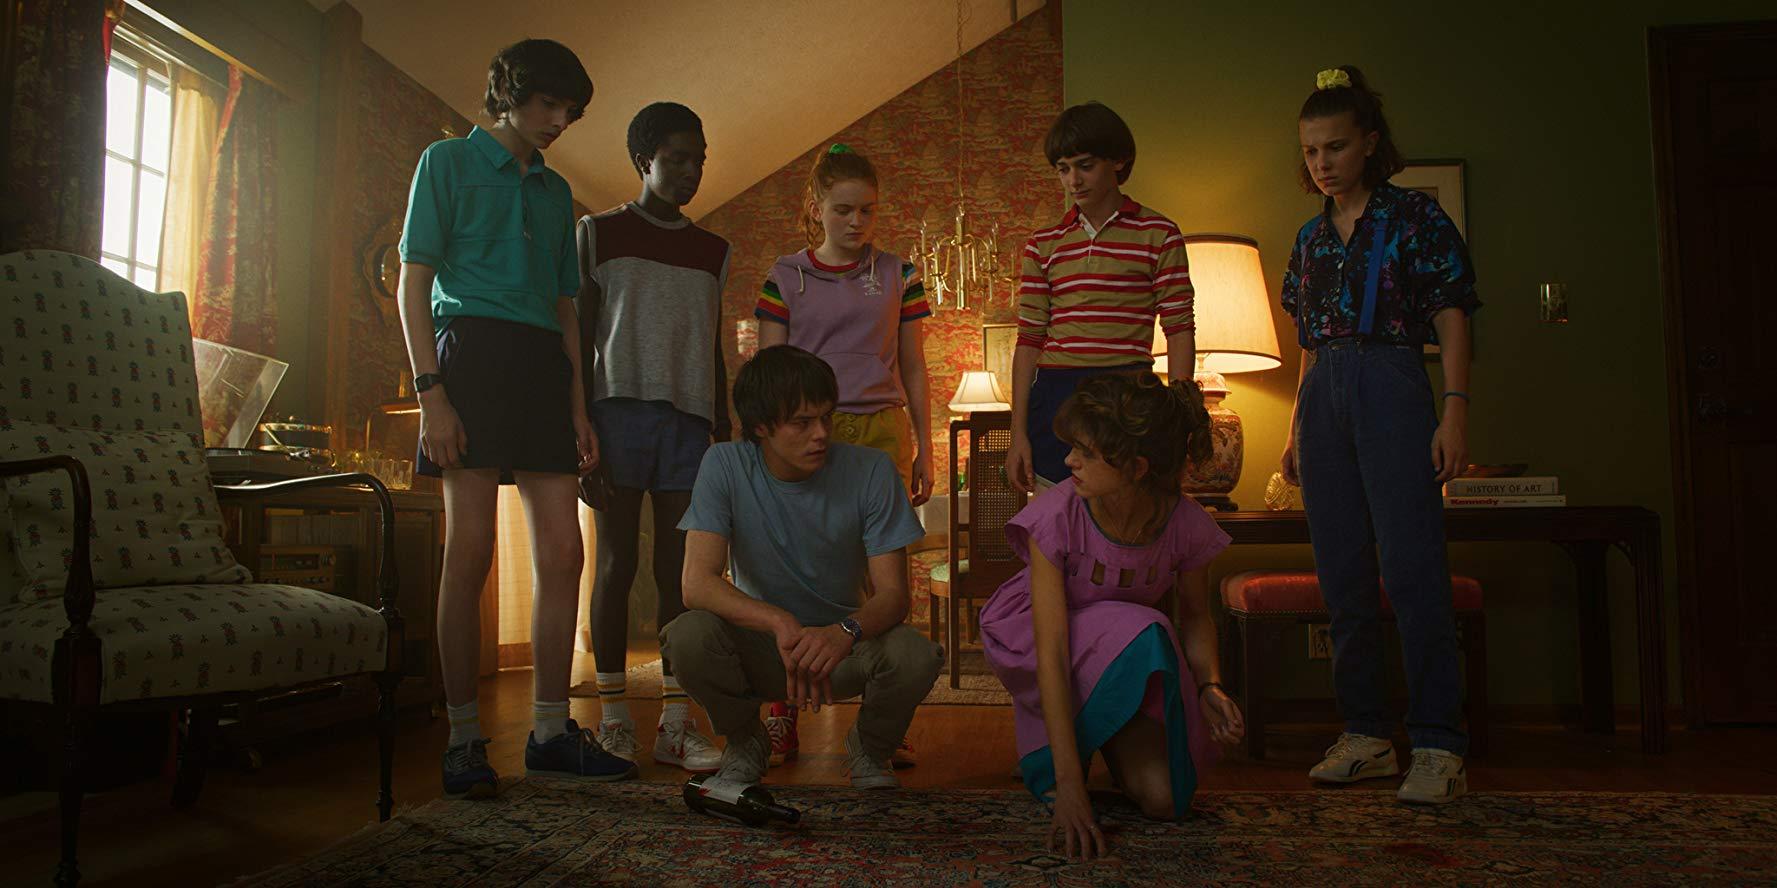 Will (Noah Schnapp), Mike (Finn Wolfhard), Eleven (Millie Bobby Brown), Max (Sadie Sink), Lucas (Caleb McLaughlin), Nancy (Natalia Dyer) und Jonathan (Charlie Heaton) in Staffel drei von Stranger Things.